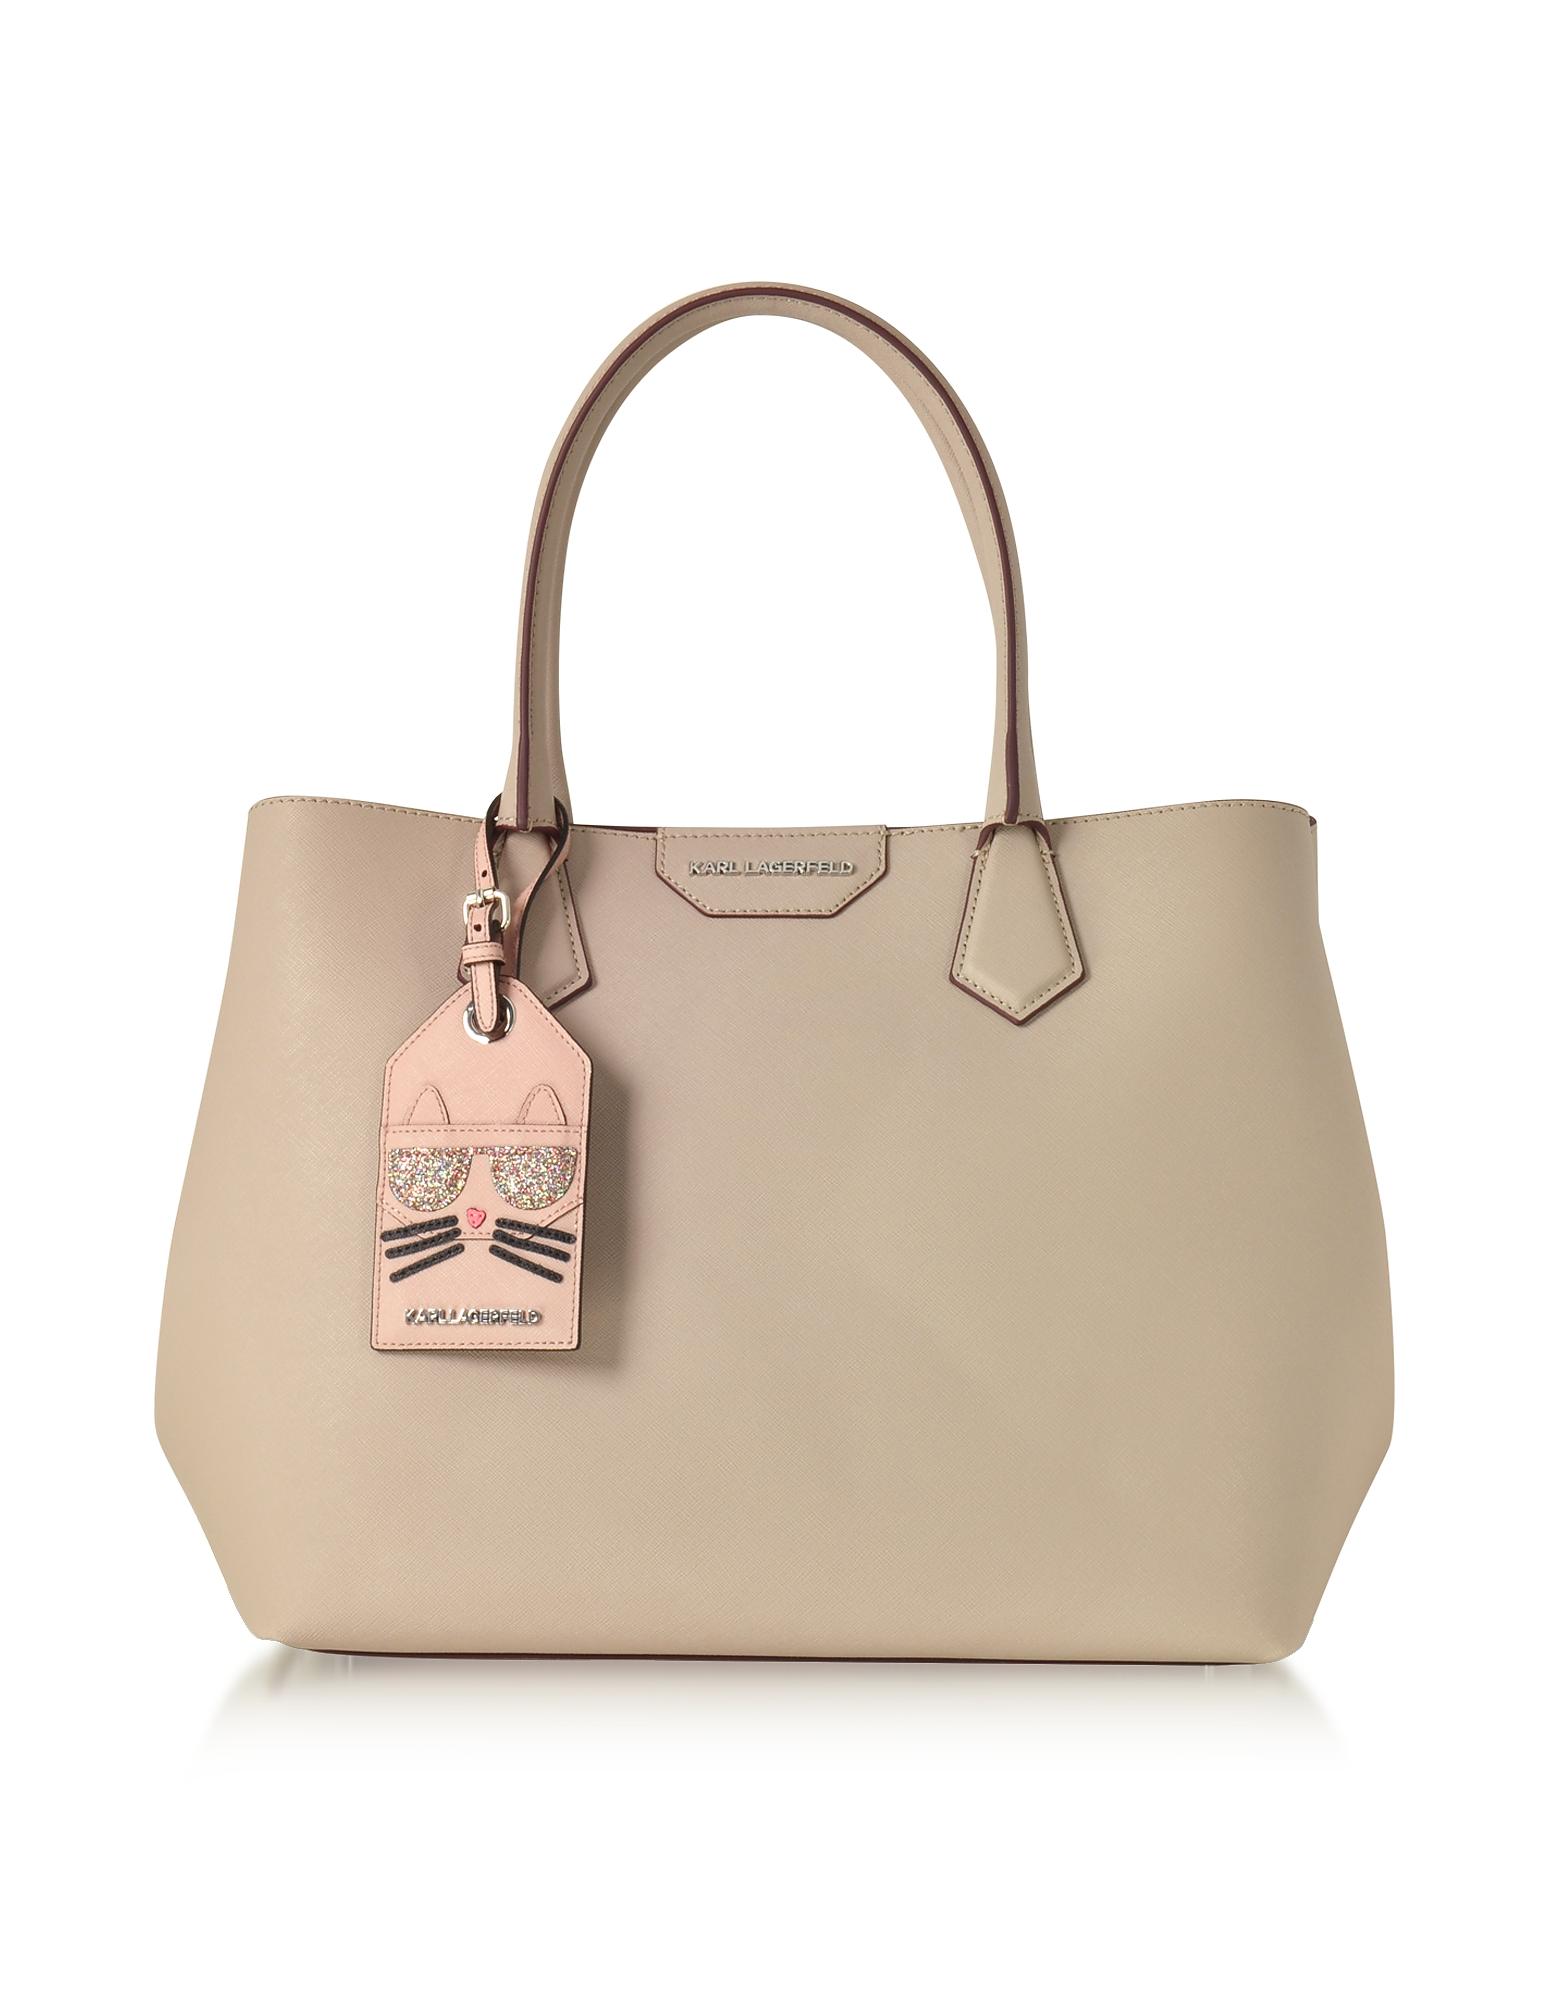 Karl Lagerfeld Handbags, K/Shopper Earth Leather Tote Bag w/Luggage Tag